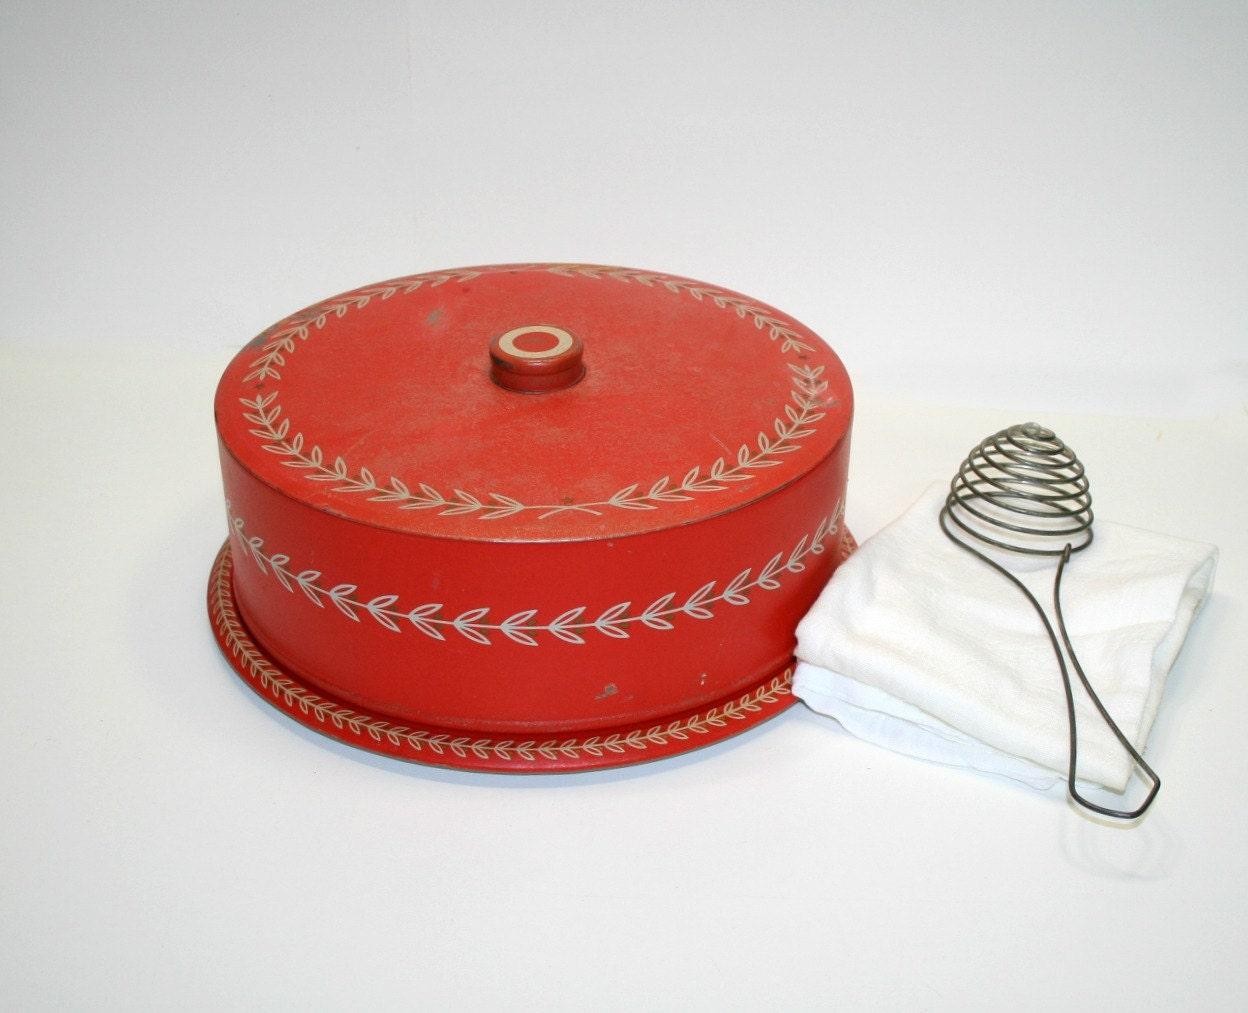 Weibro Cake Server Americana Cake Tin Copper And Wood Grain